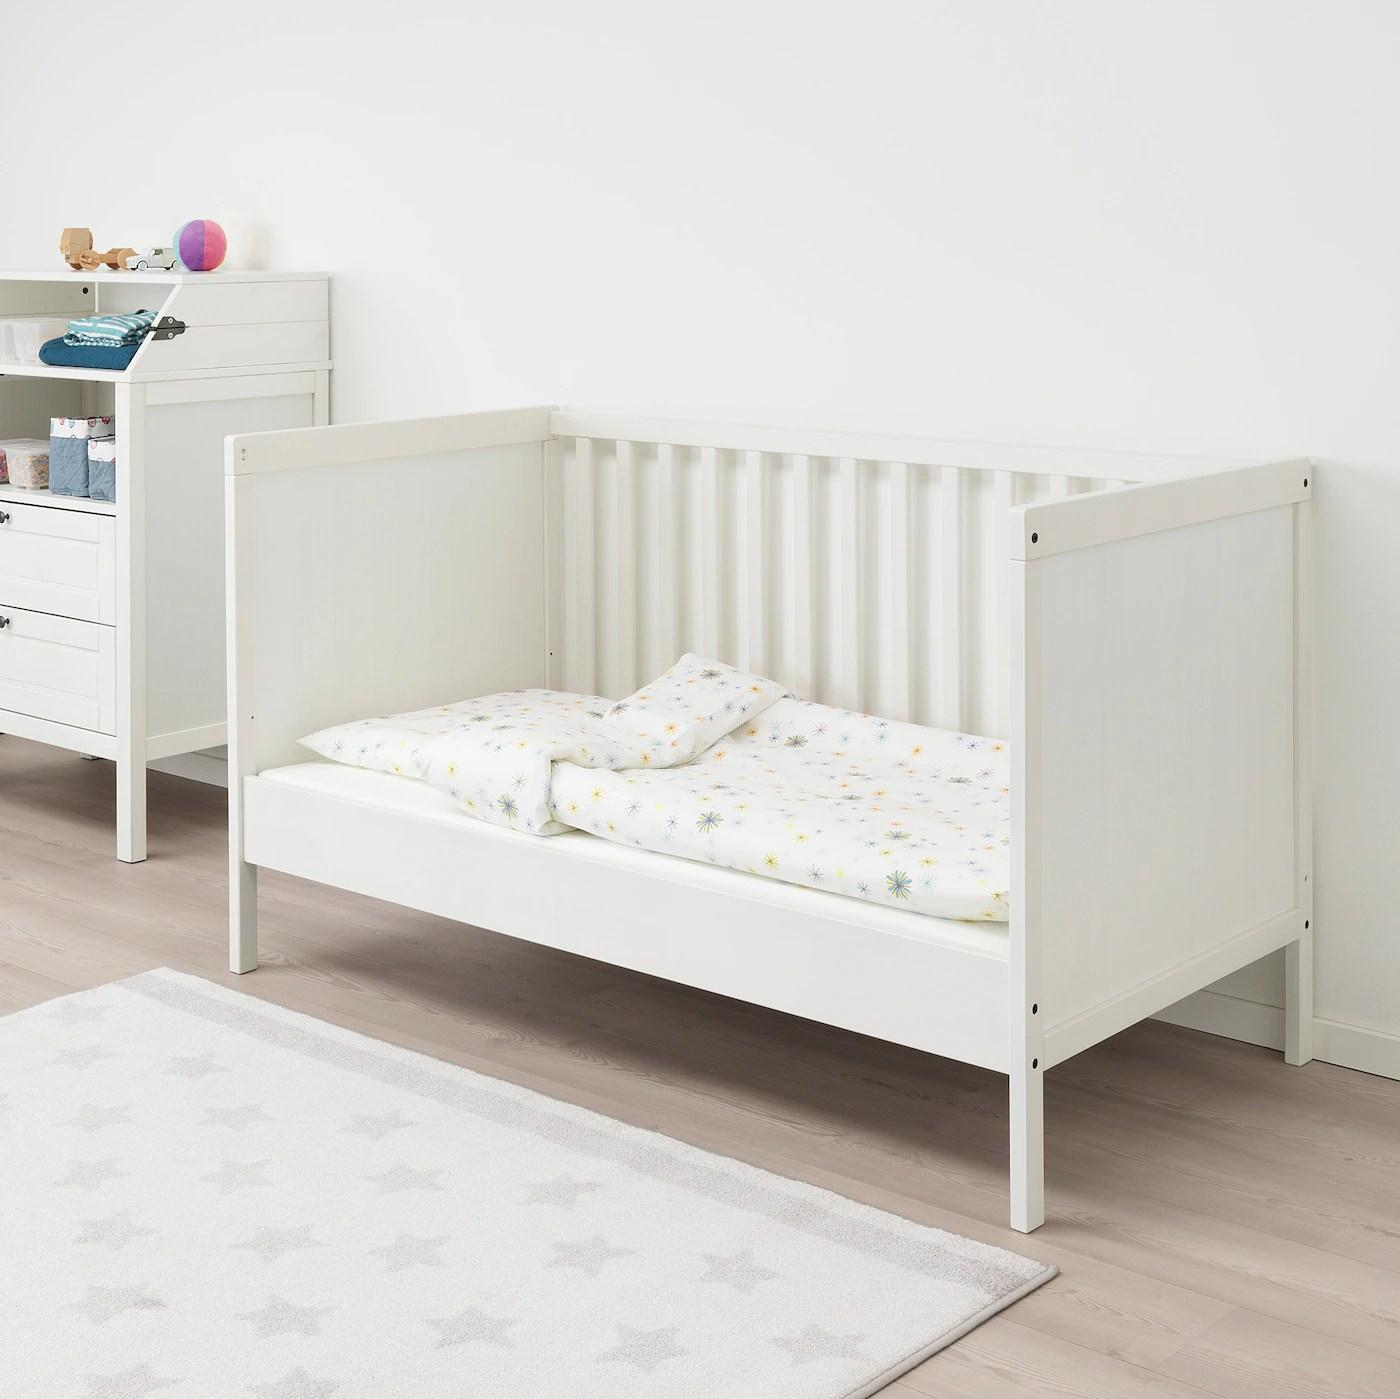 Sundvik Lit Bebe Blanc 70x140 Cm Ikea Suisse